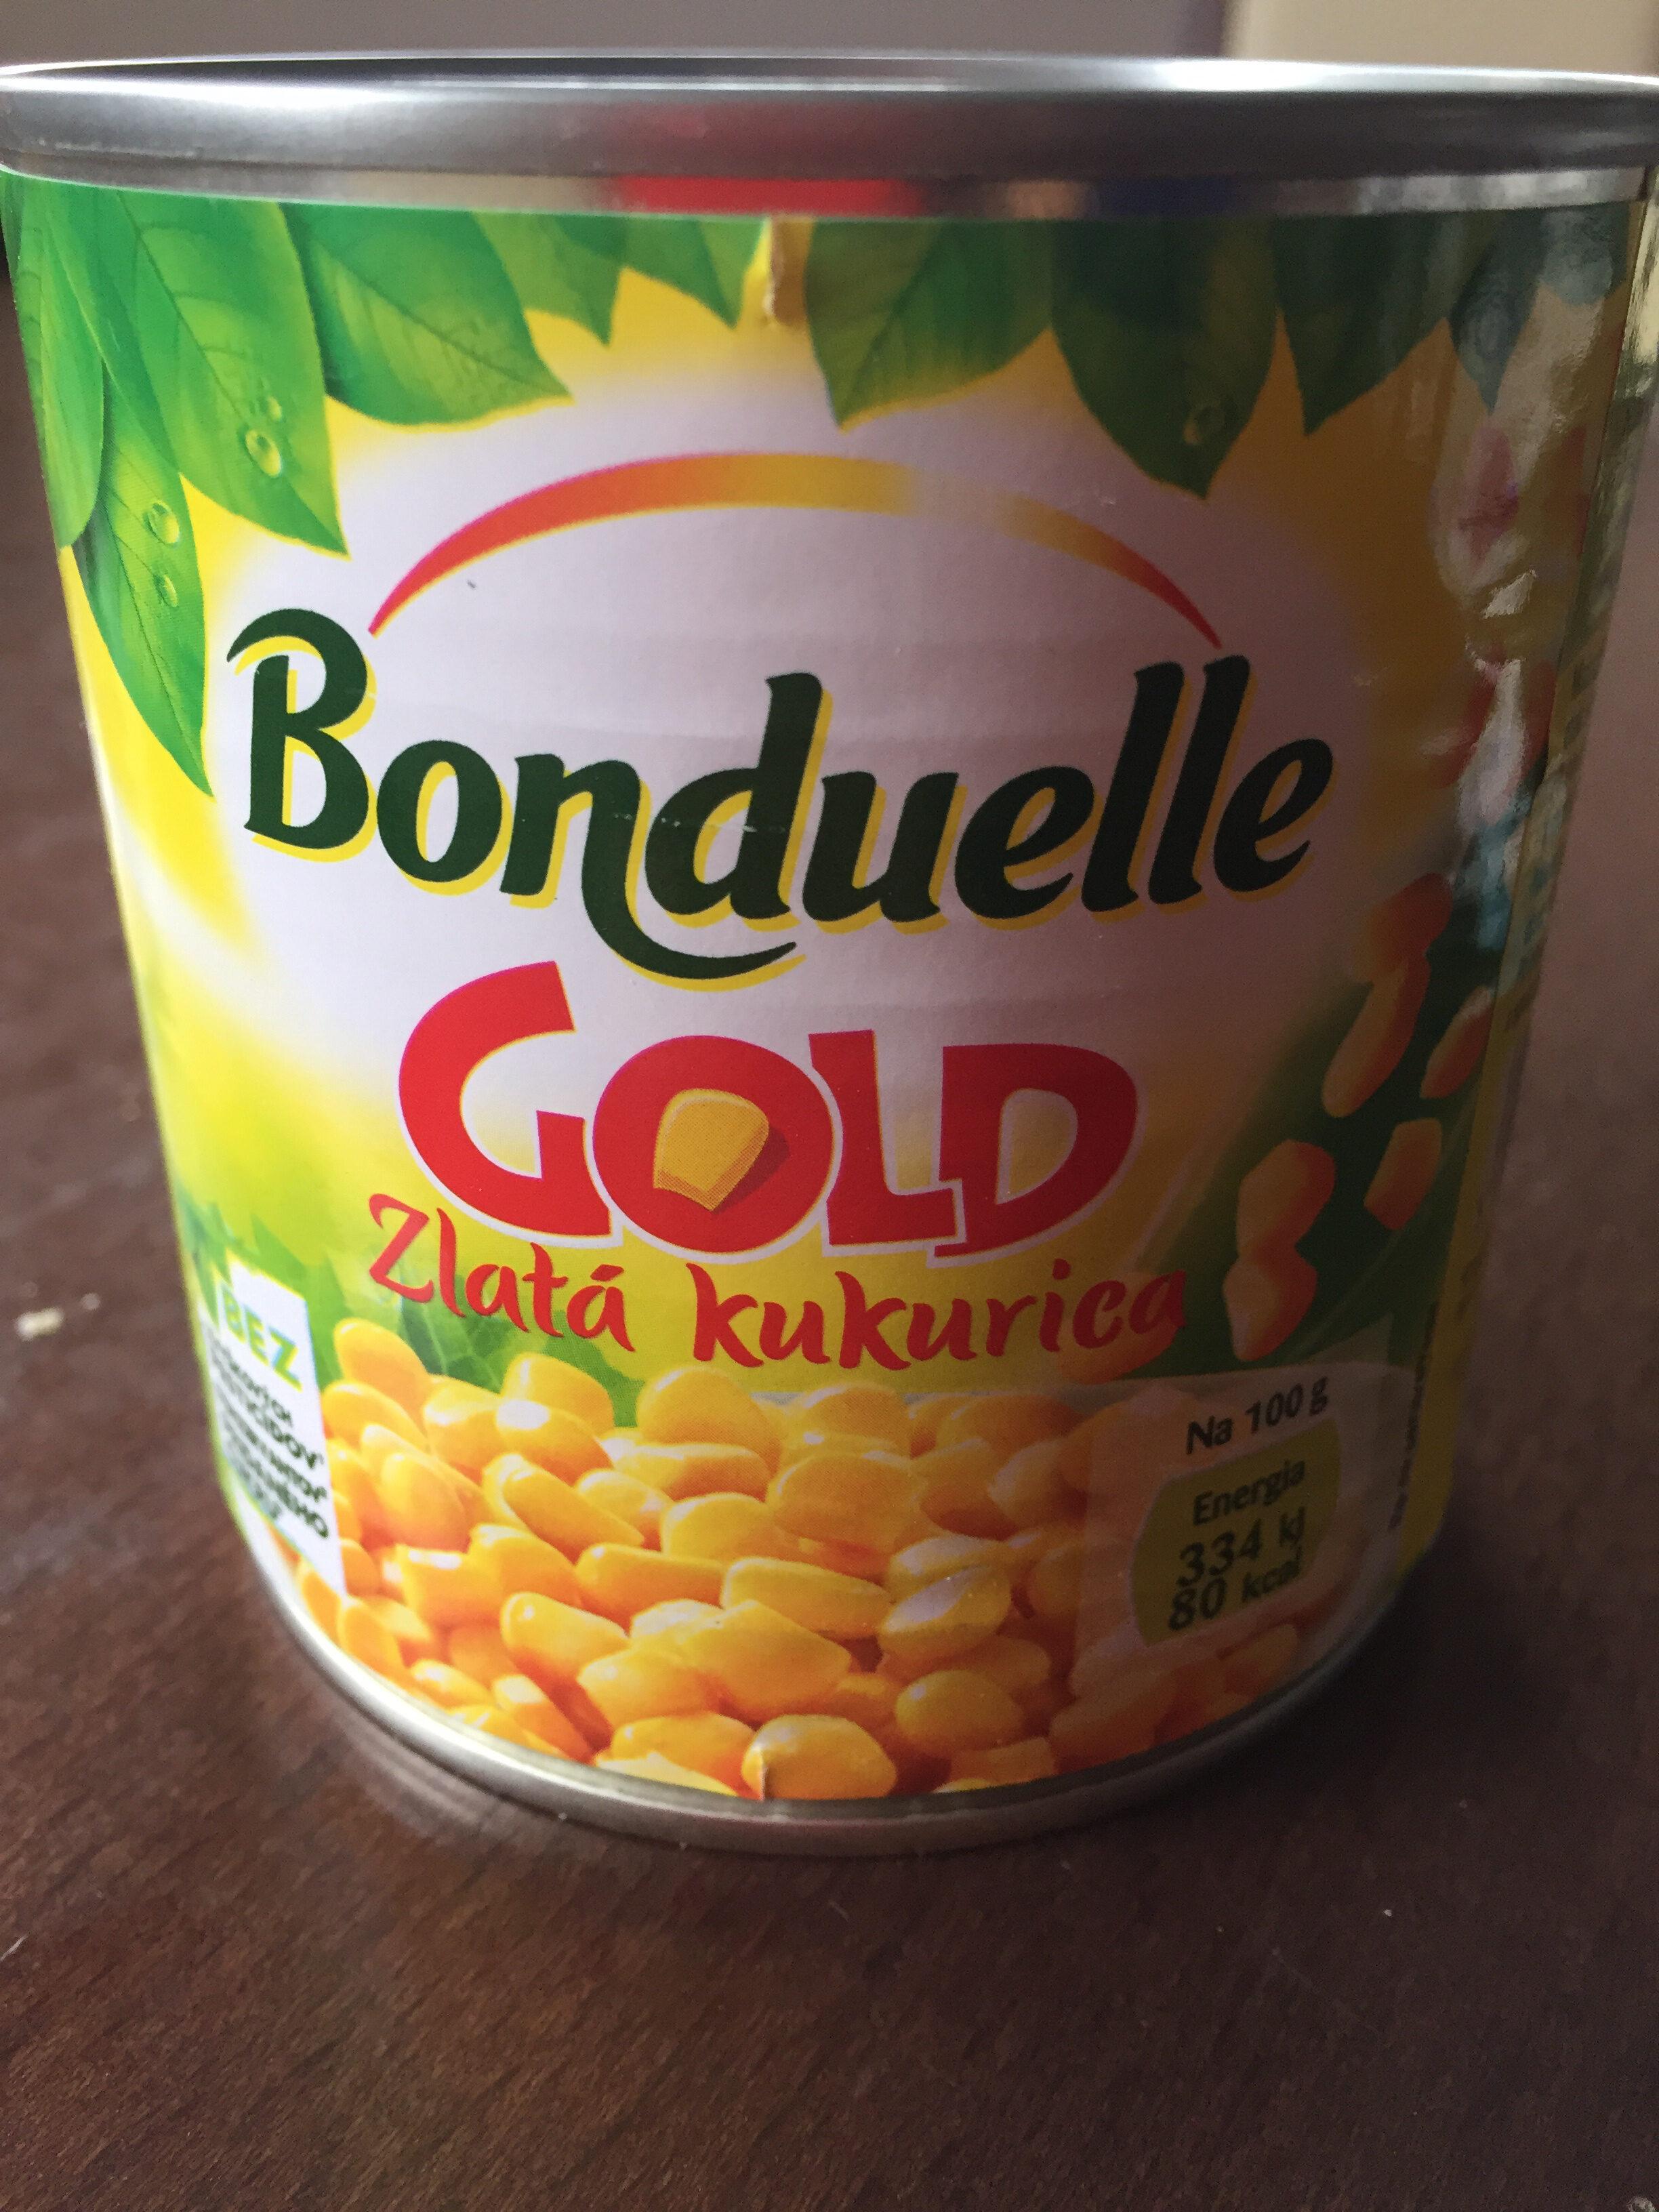 Bondu Kukurydza Z?ocista 400Ml - Produkt - cs